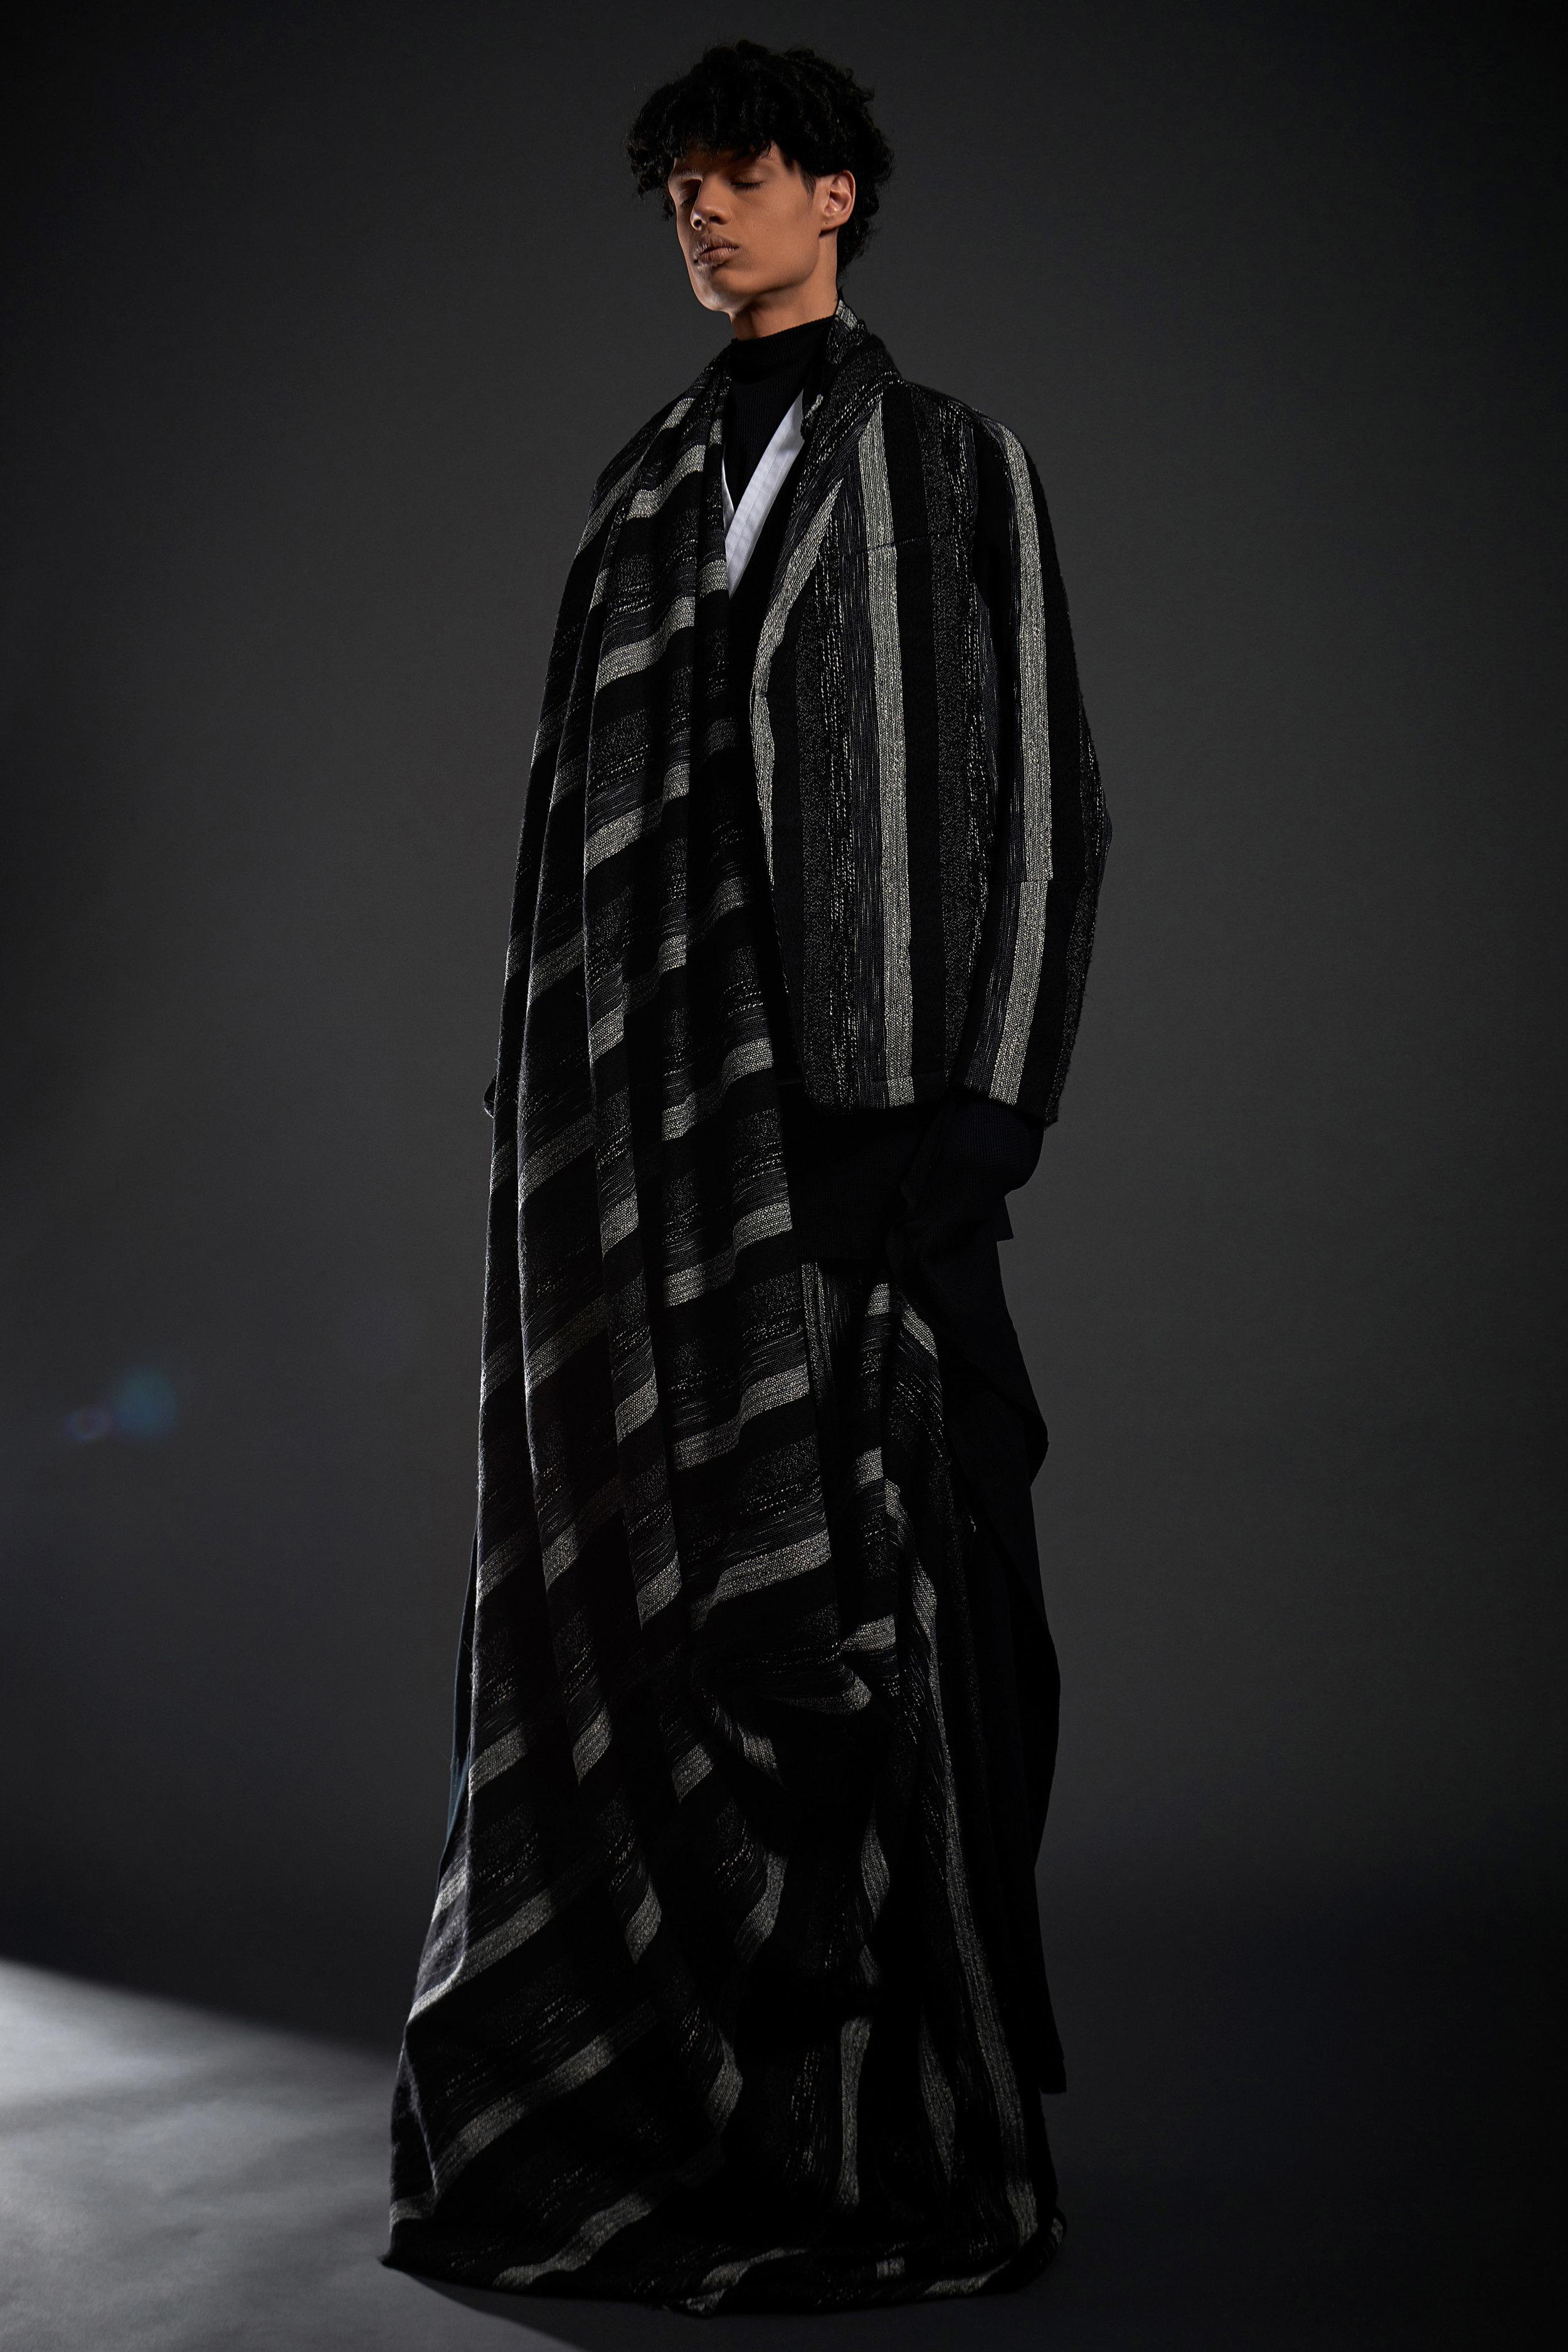 Look 14   ARC Jacket 6  / Black and White Melange   ARC Kimono Shirt  / White